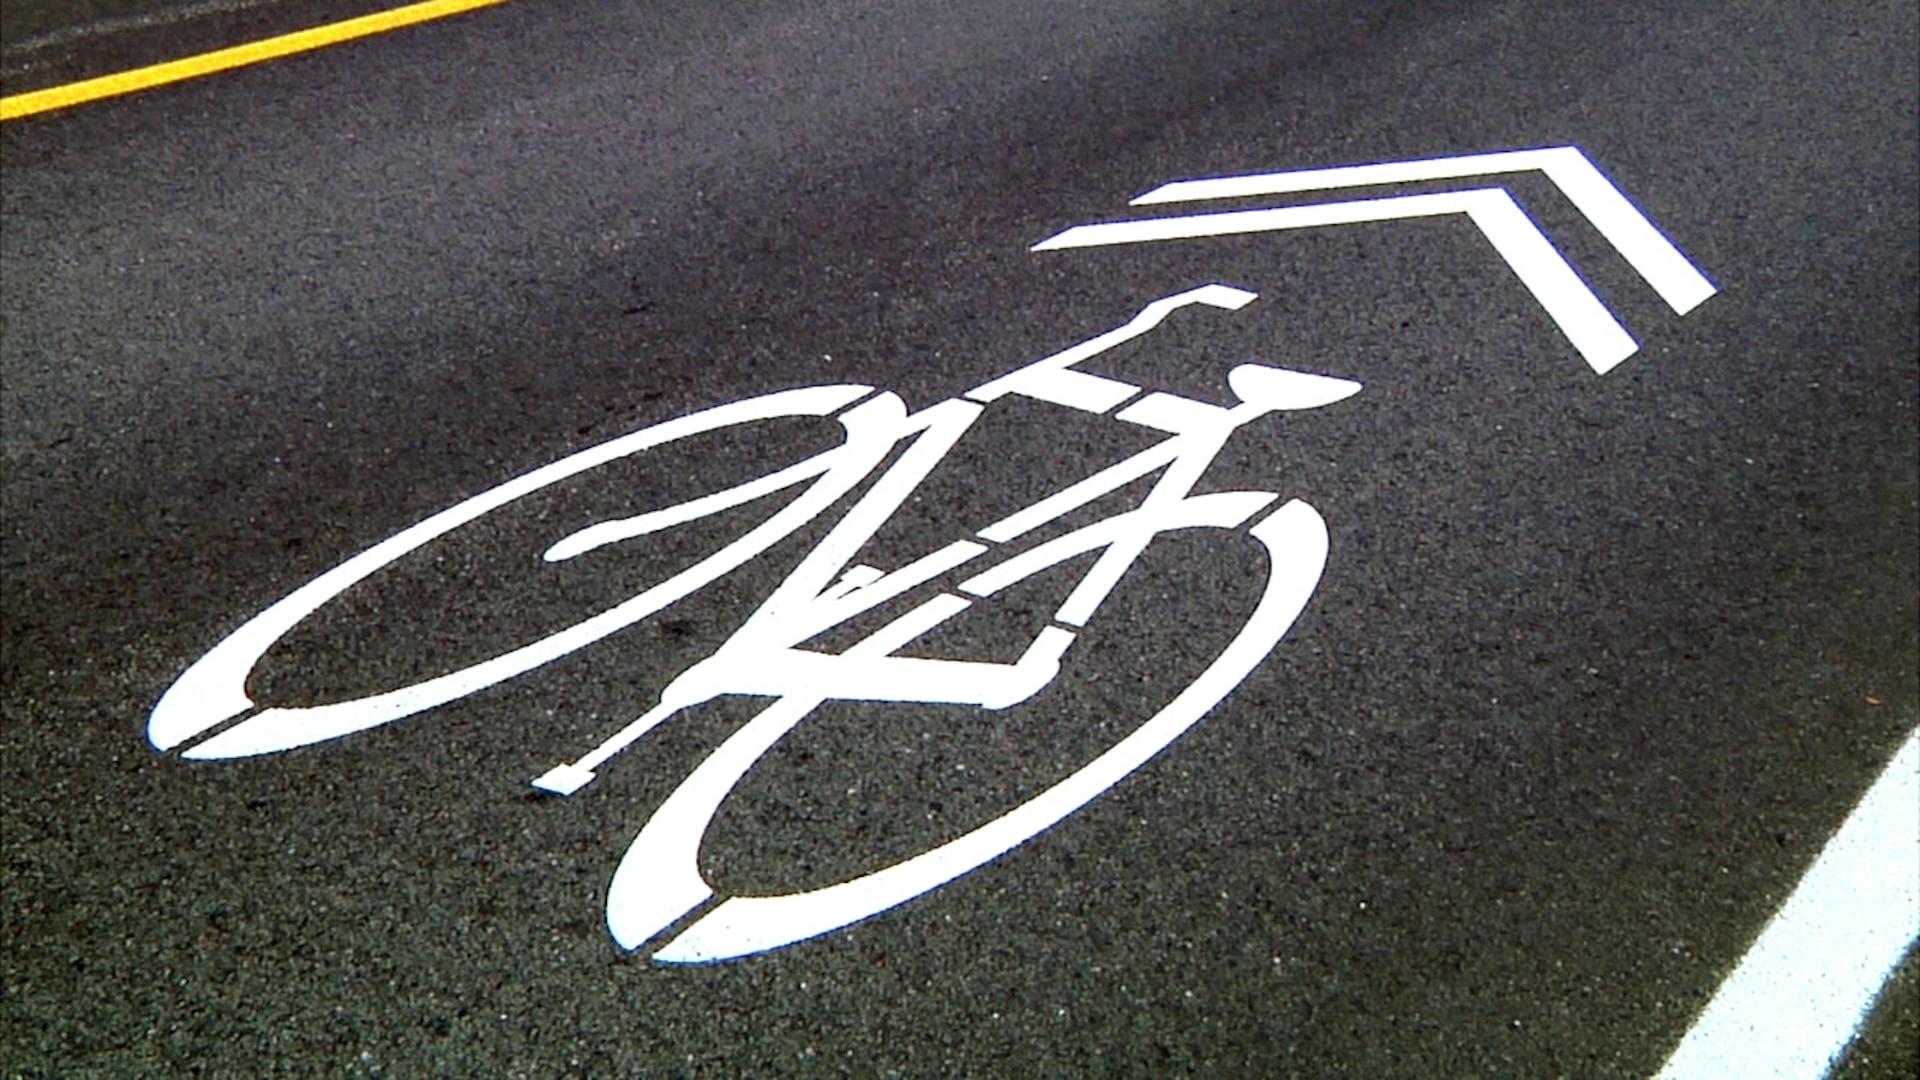 NSA made the bridge bike-friendly by adding 'sharrows.'